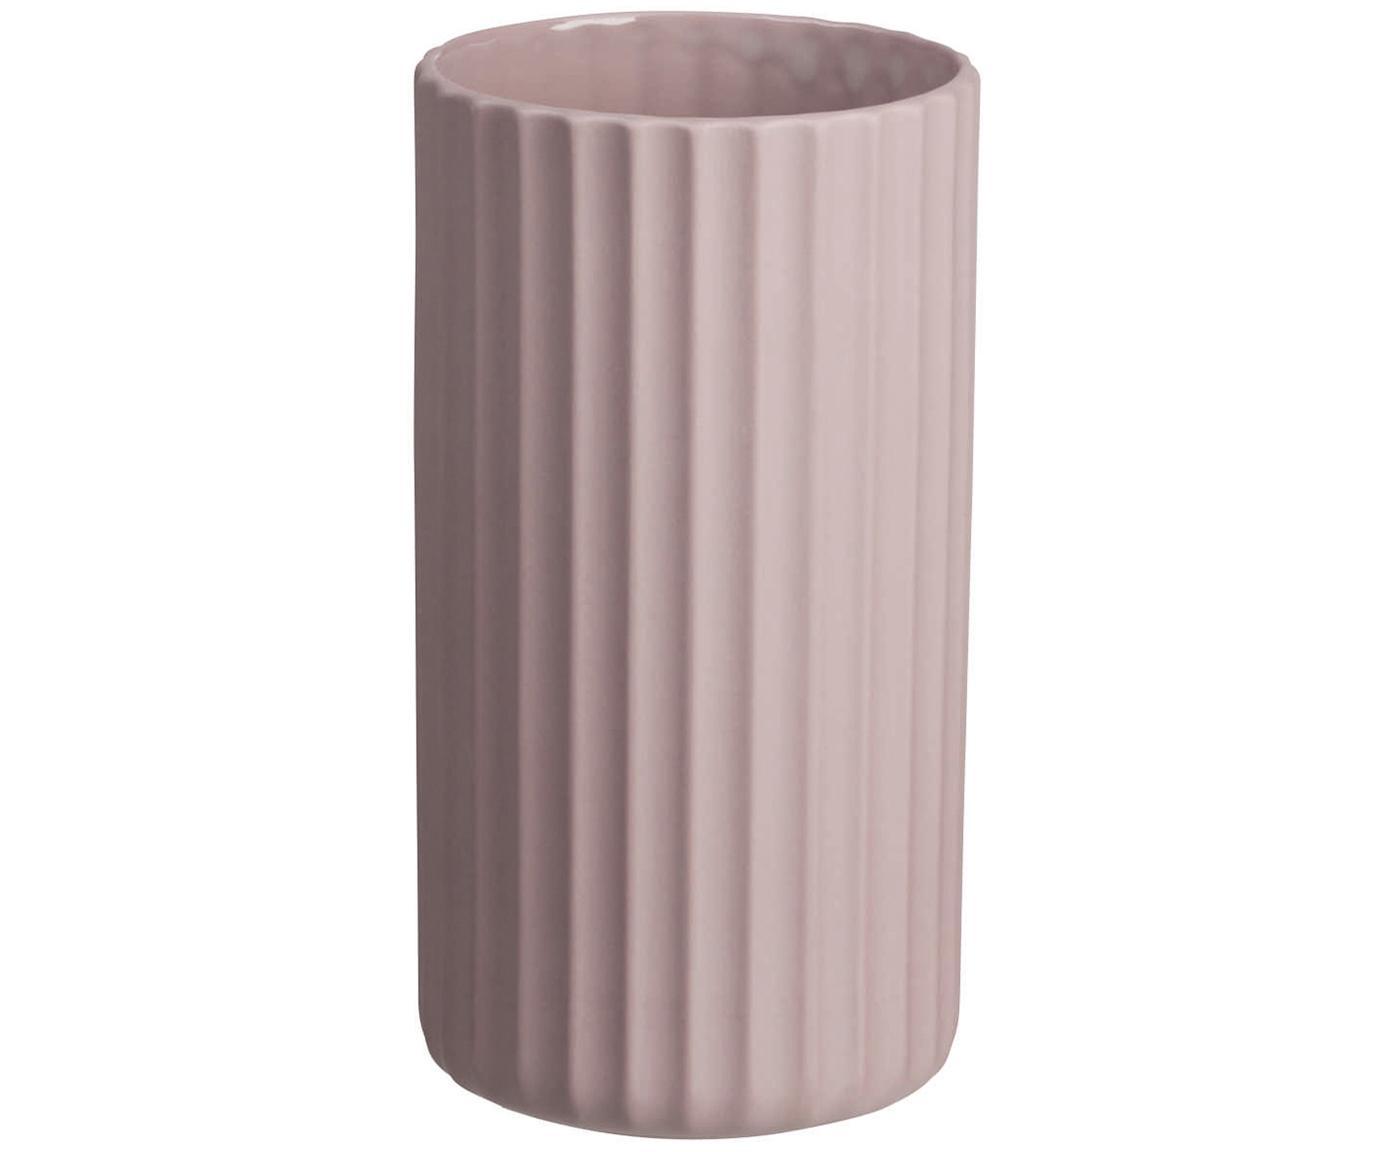 Handgemaakte vaas Yoko van porselein, Porselein, Roze, Ø 9 x H 16 cm